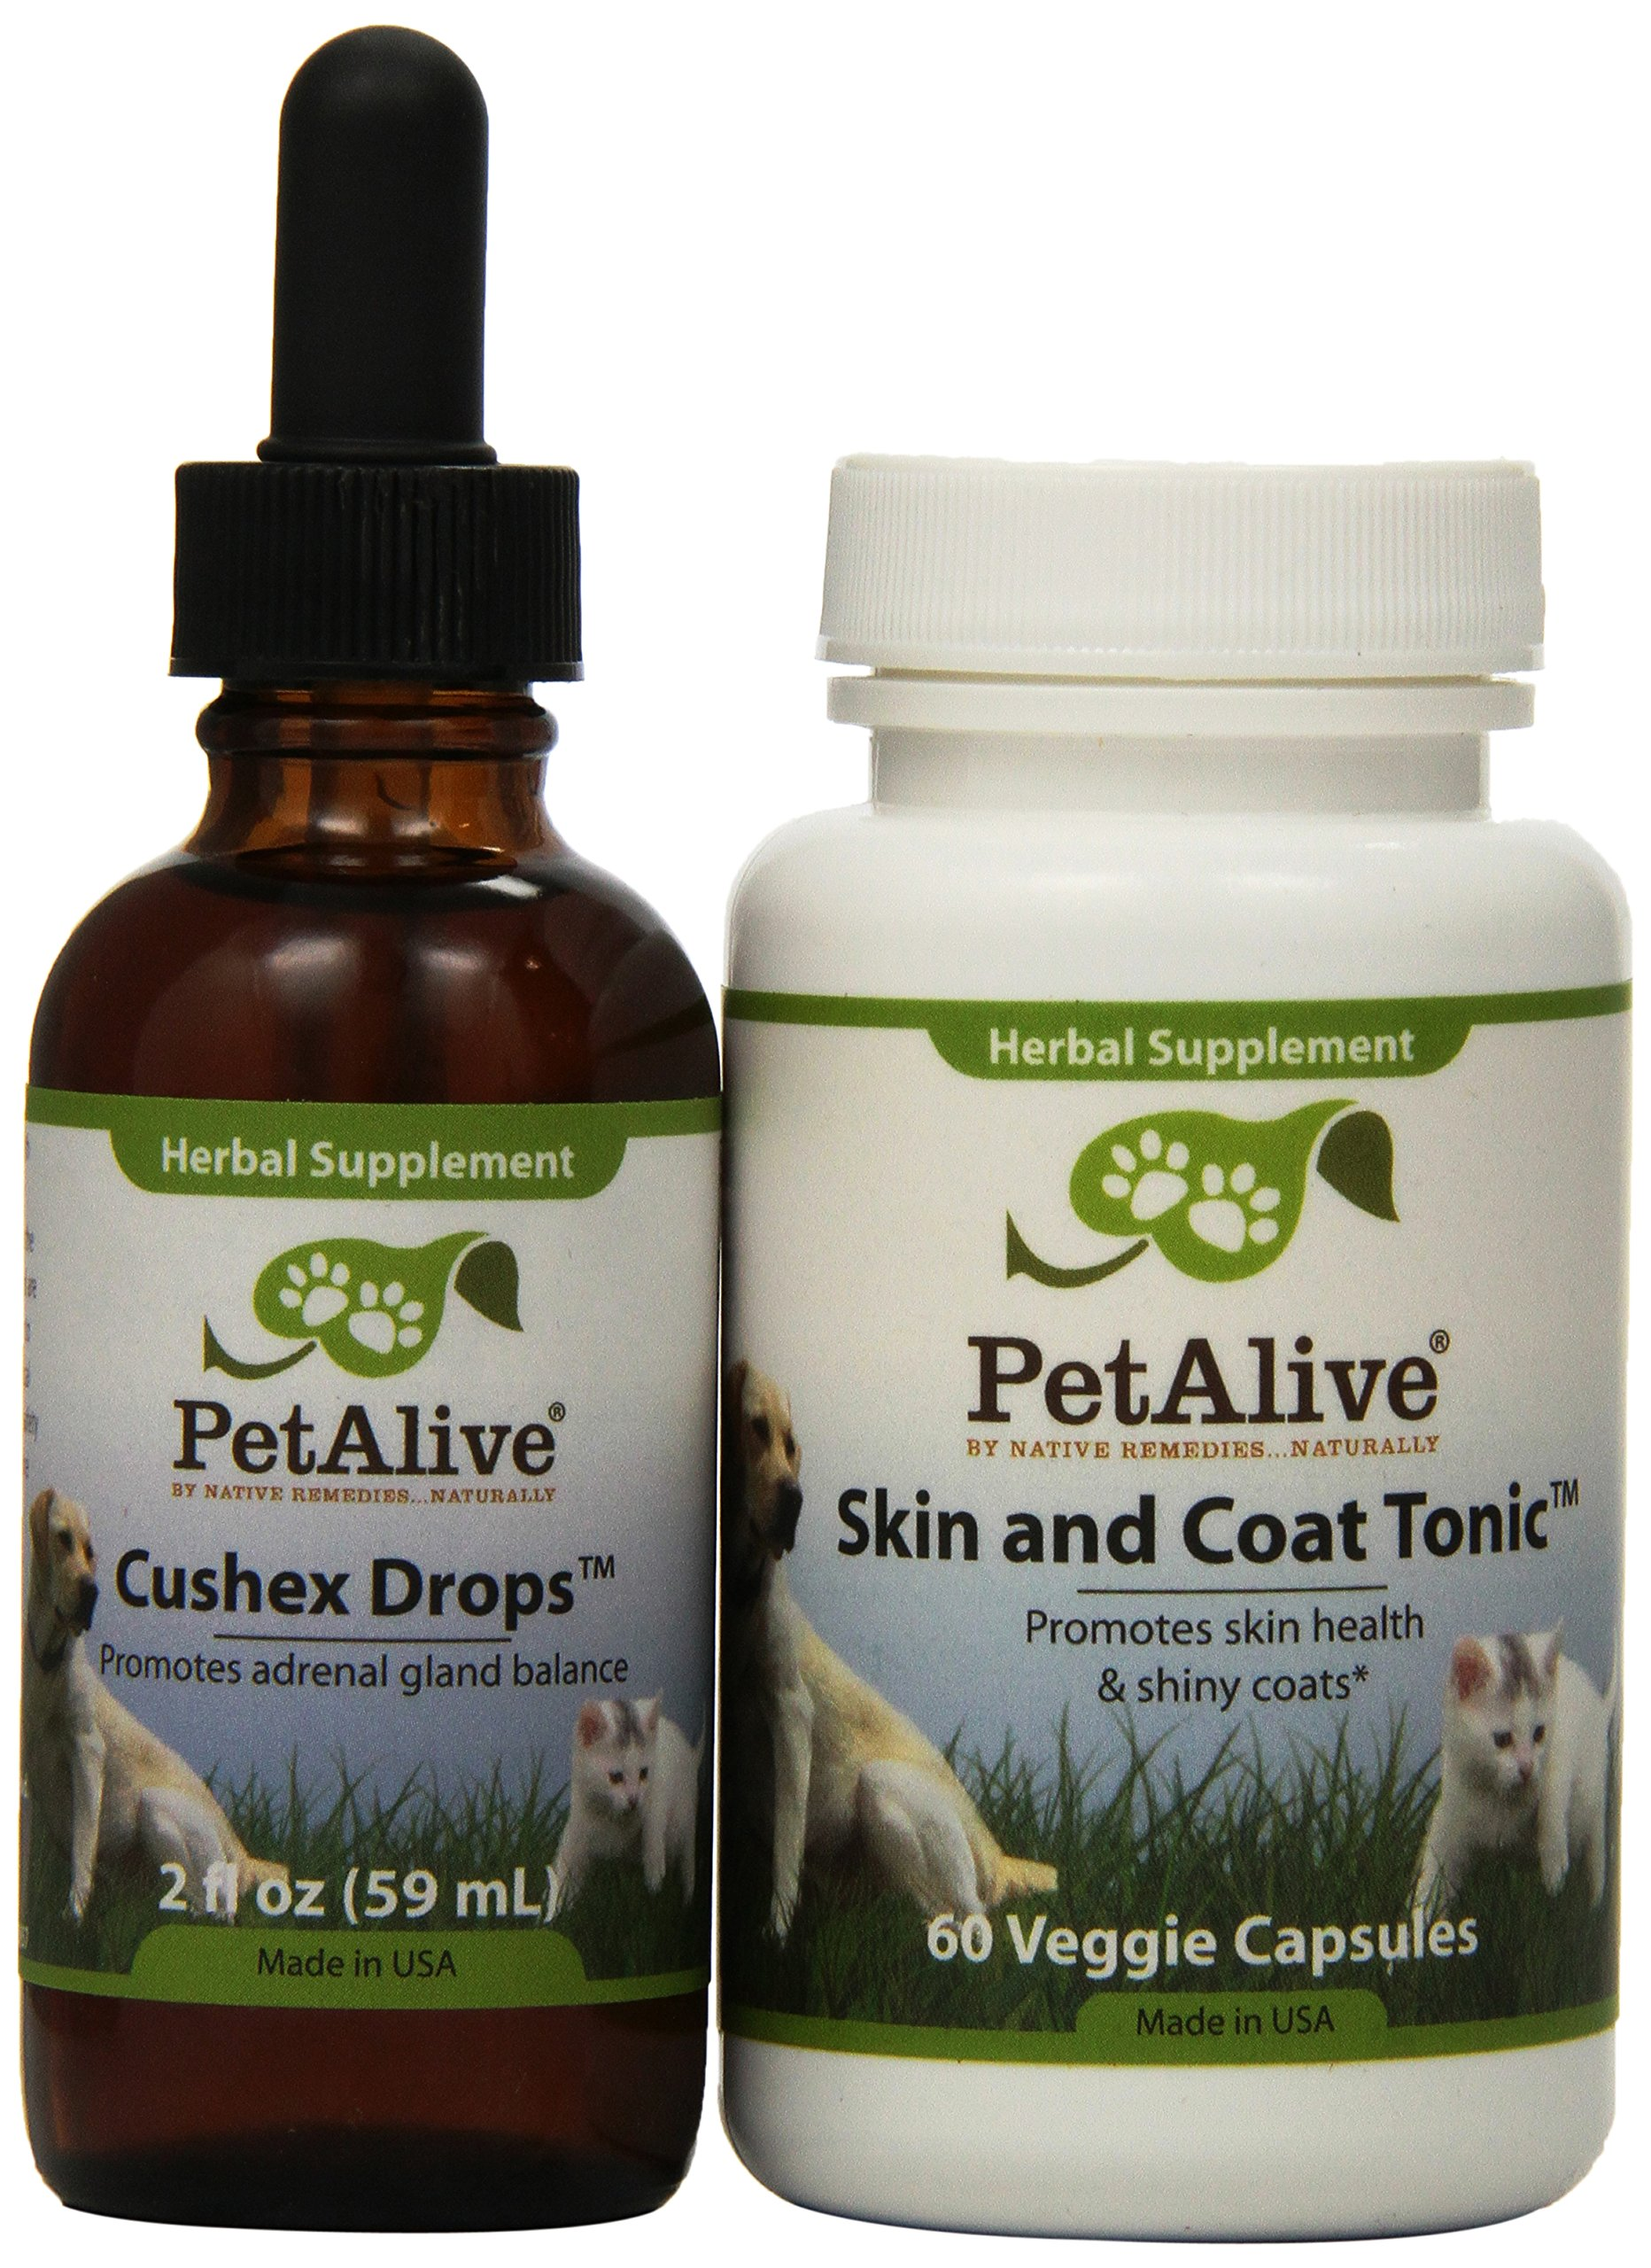 Pet Alive Cushex Drops and Skin & Coat Tonic Combo Pack